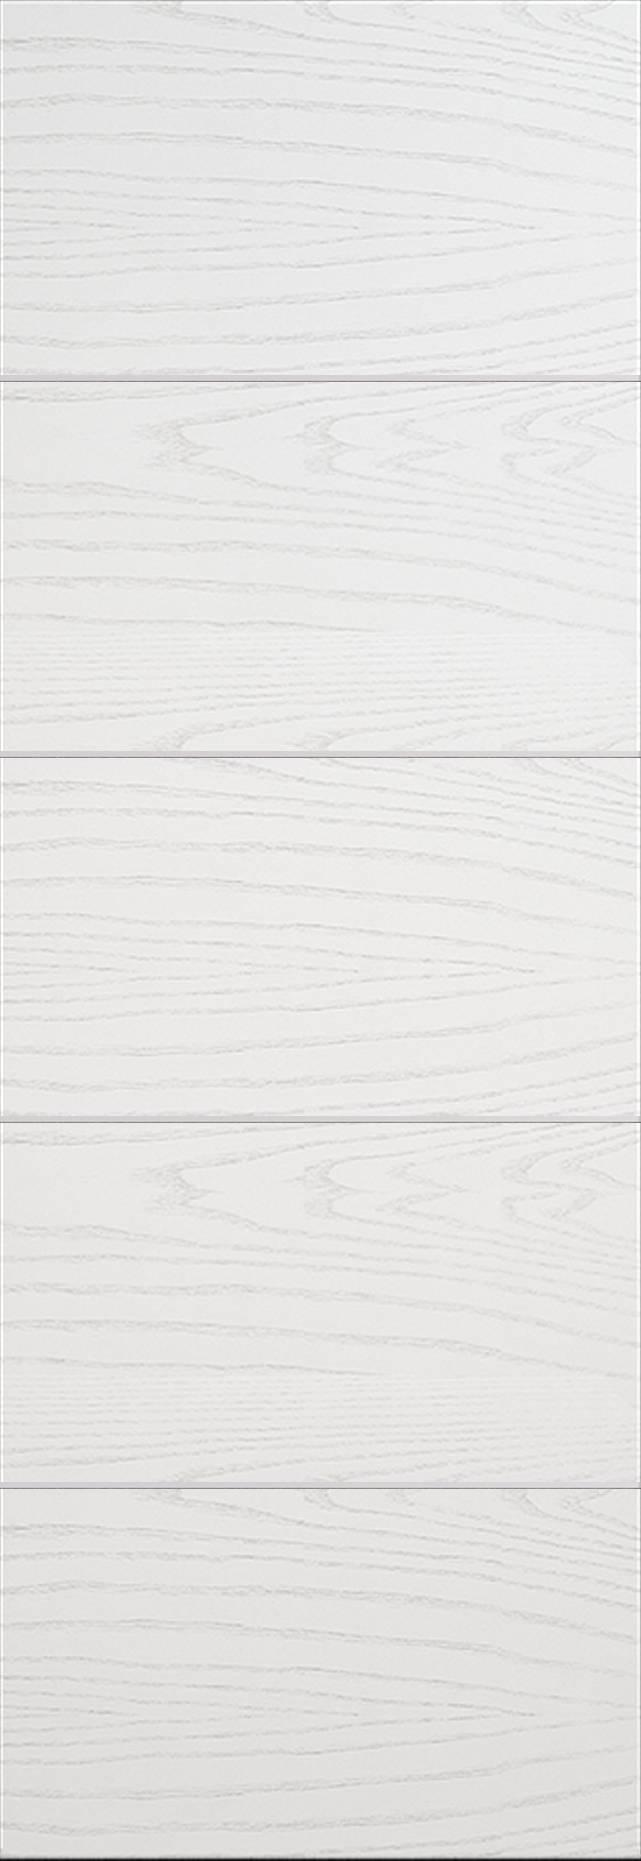 Tivoli Д-3 Invisible цвет - Ясень белая эмаль Без стекла (ДГ)